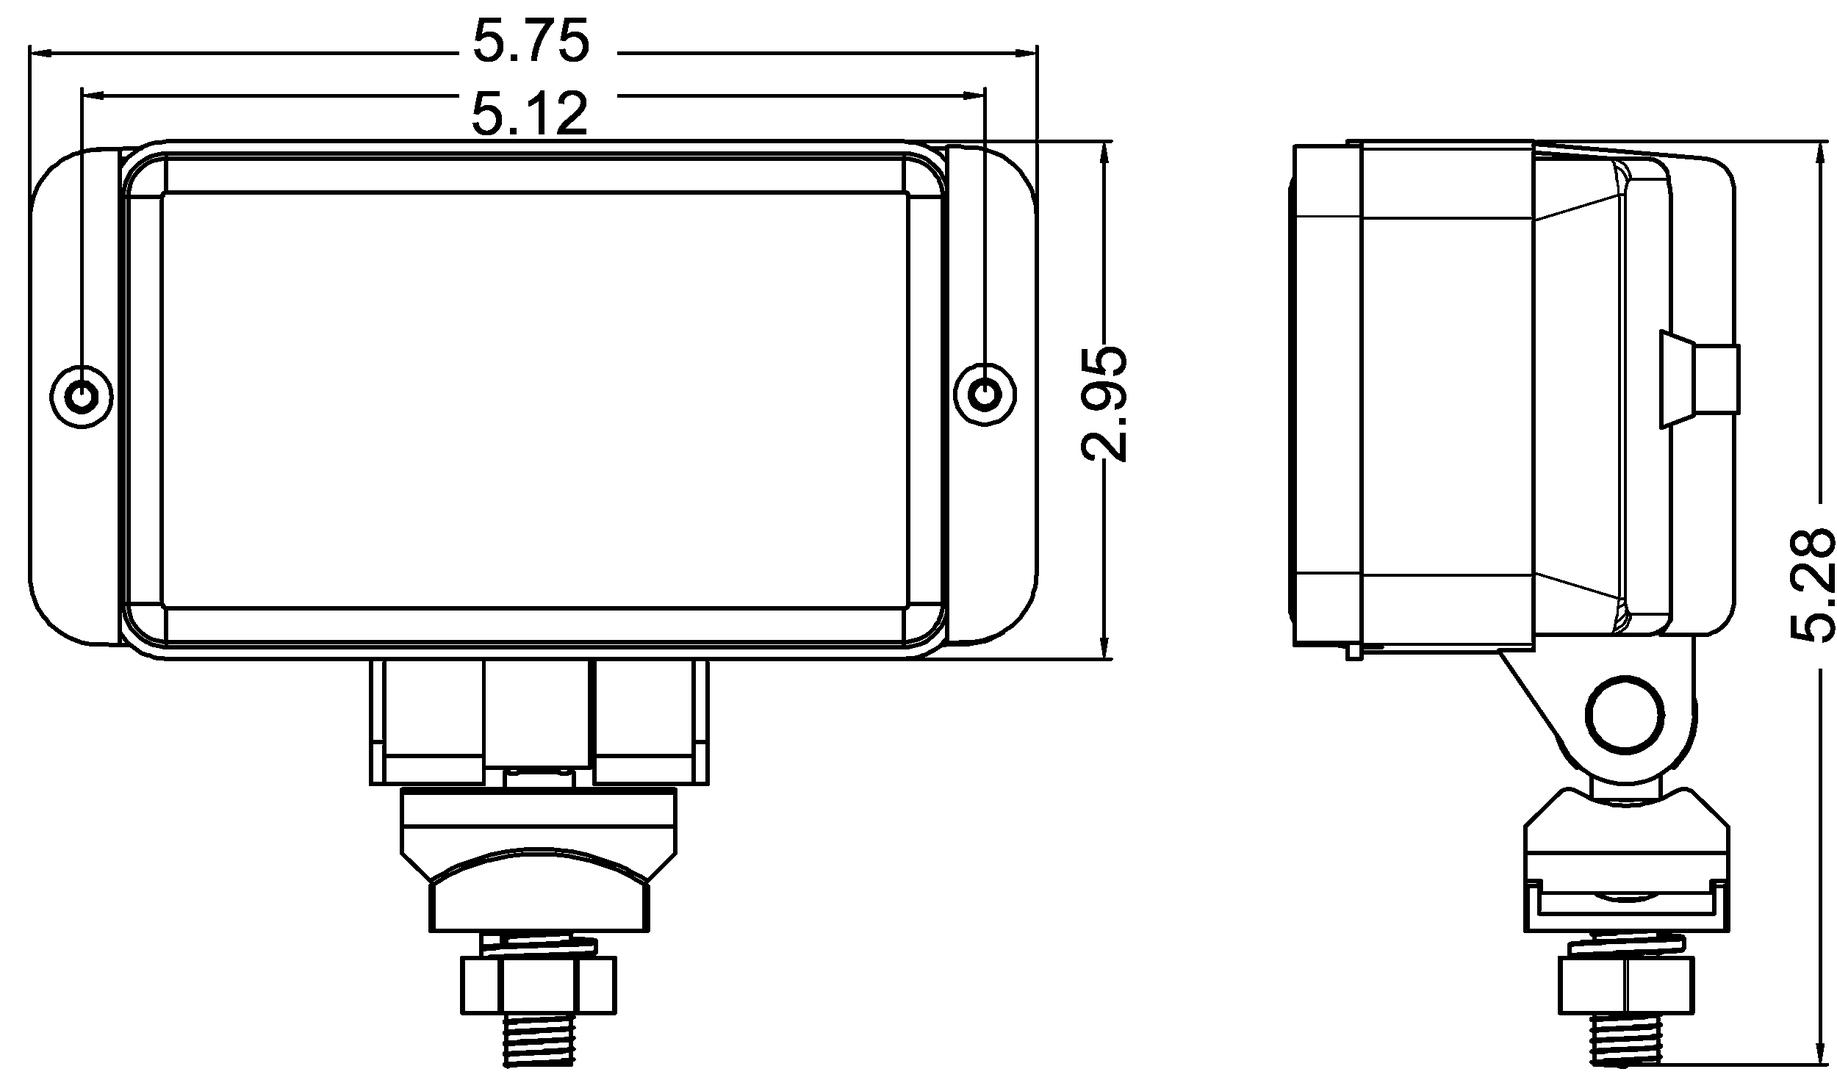 Rectangular Fog Lamp With 55 Watt Halogen Bulb